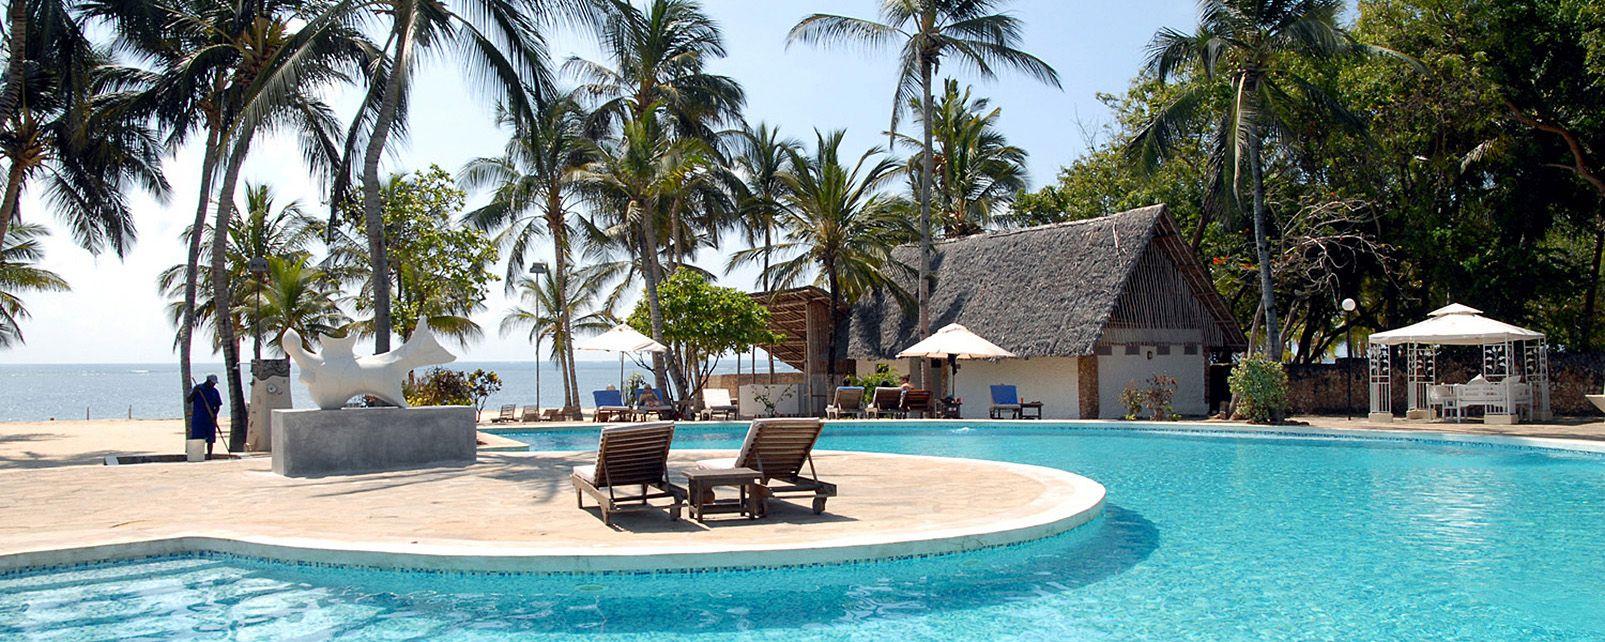 Hôtel Dream of Africa